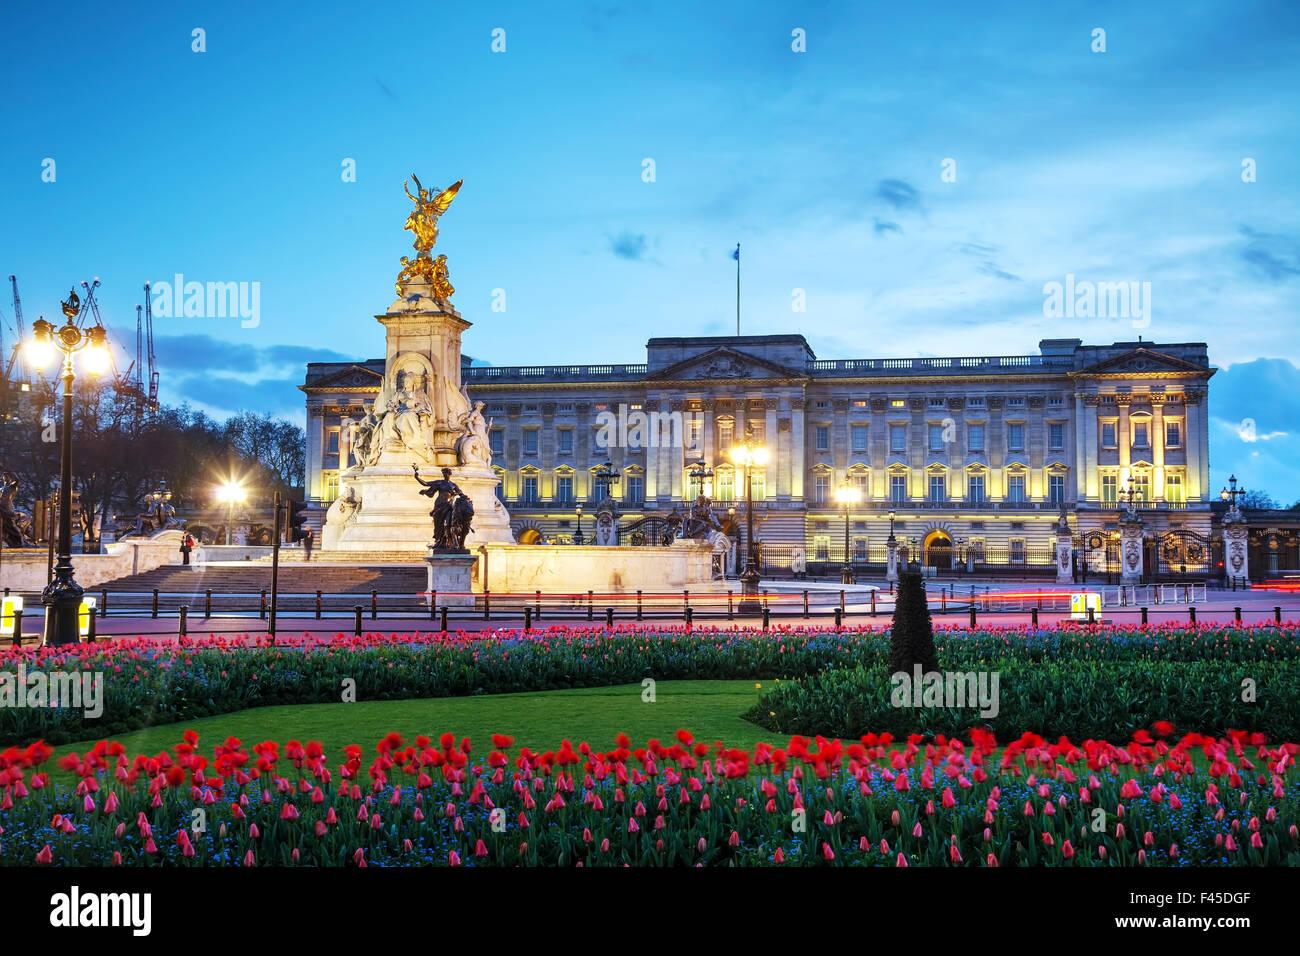 Buckingham palace in London, Great Britain - Stock Image